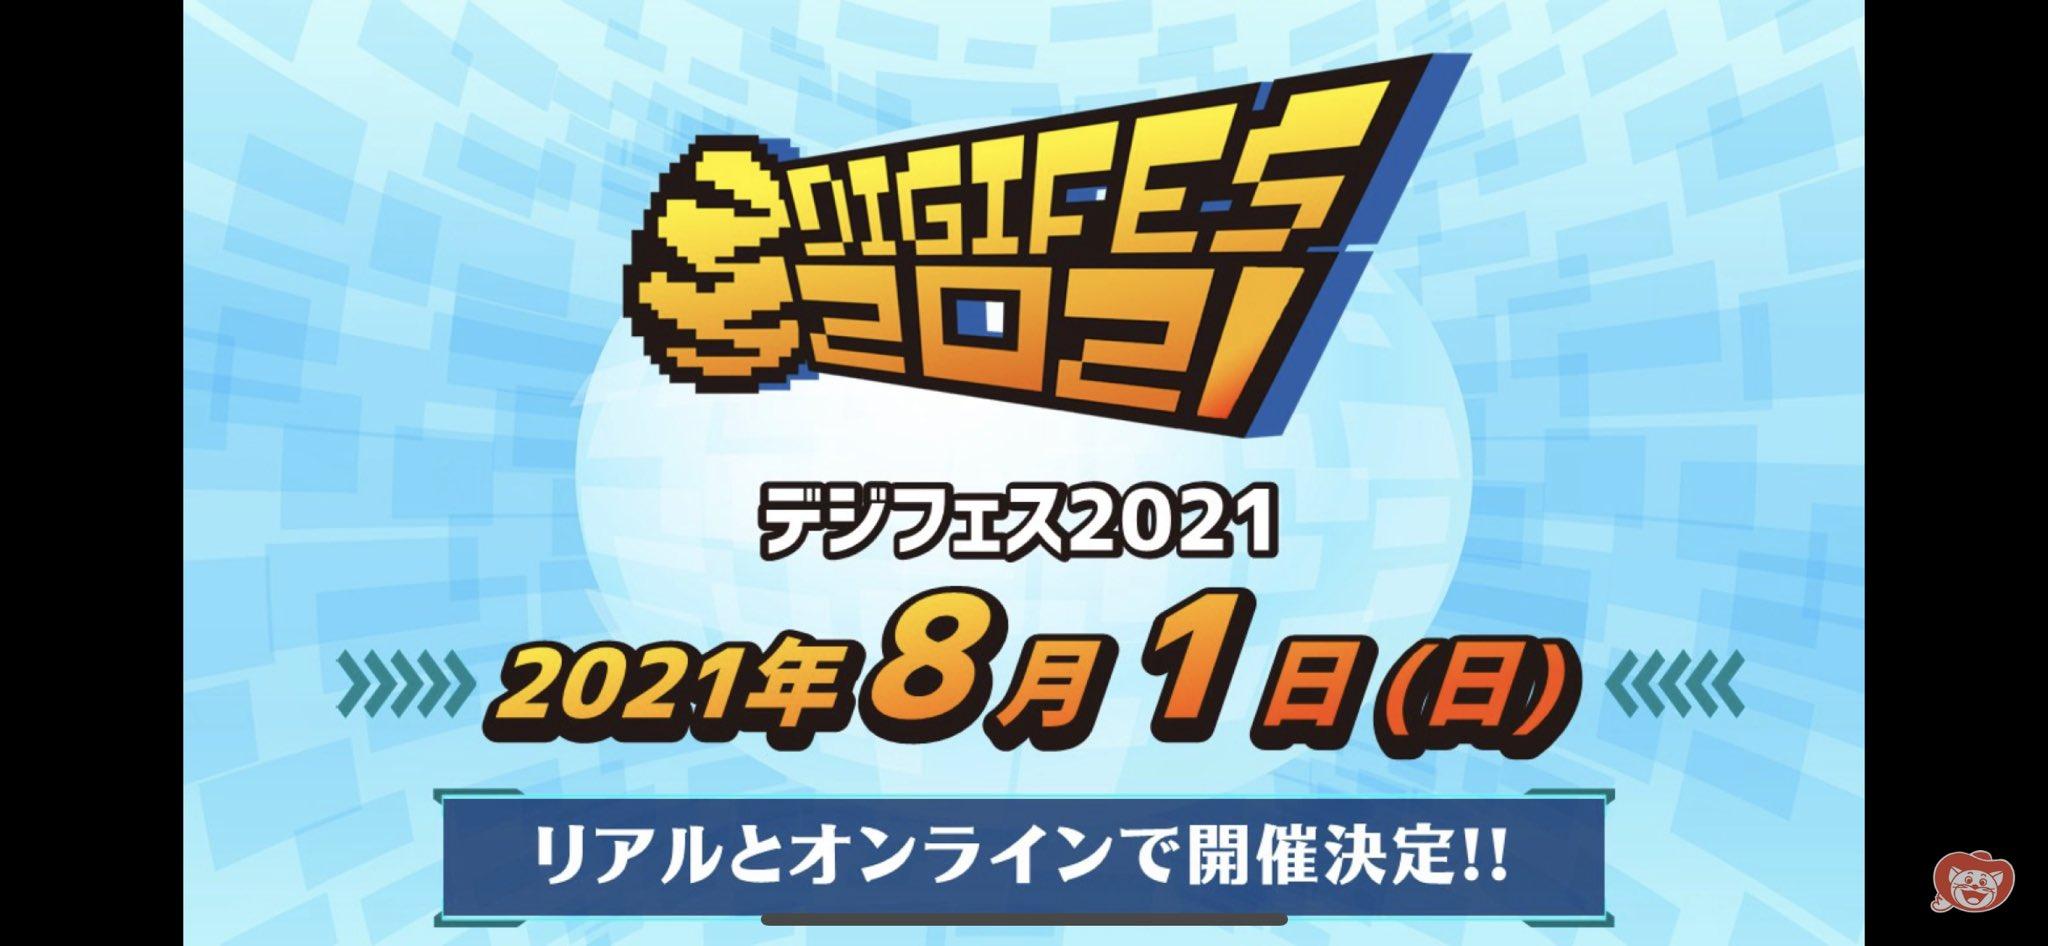 DigiFES 2021